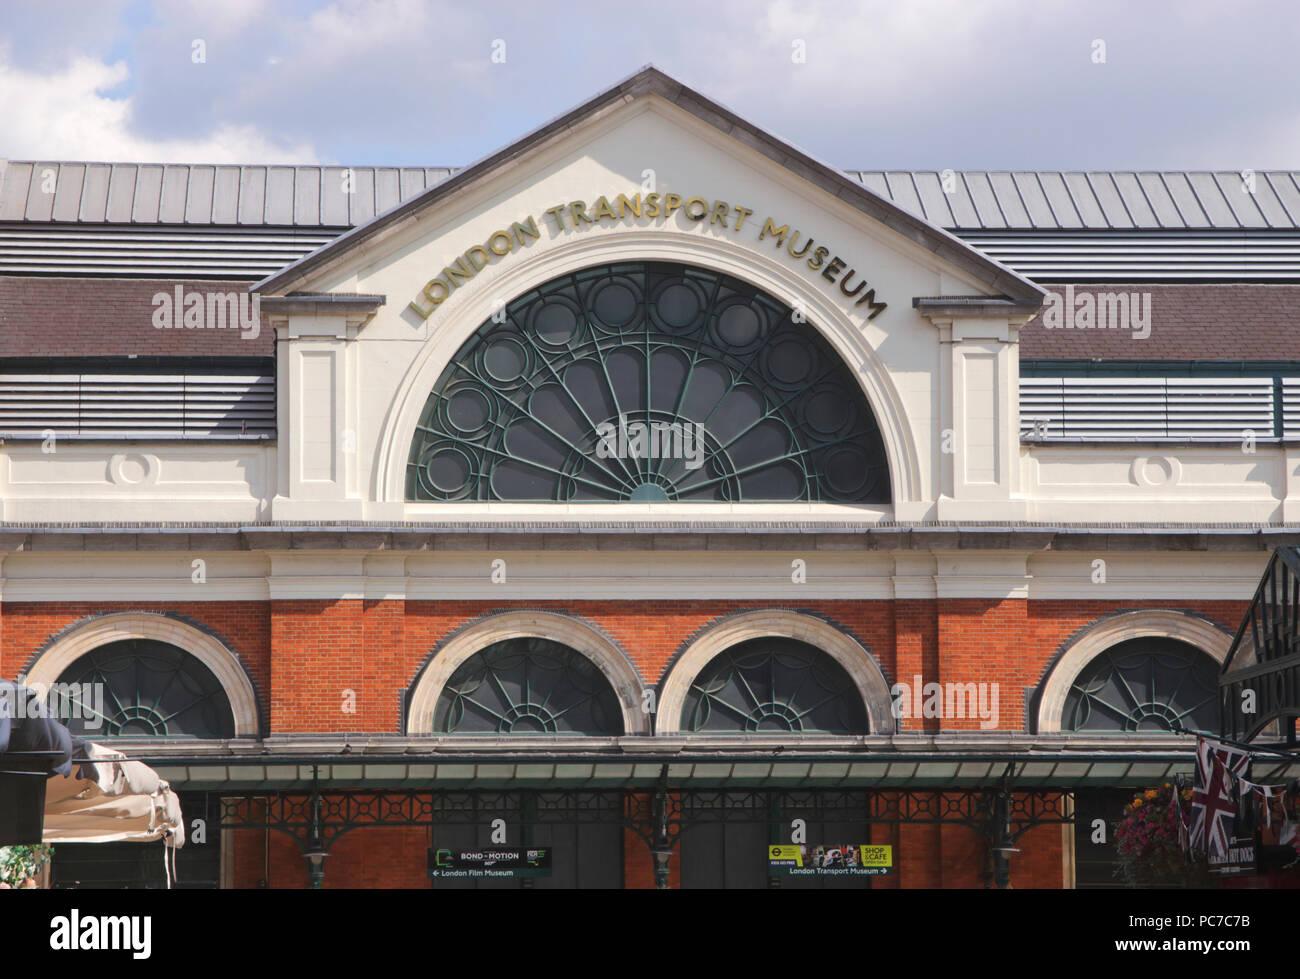 London Transport Museum Covent Garden London Stock Photo